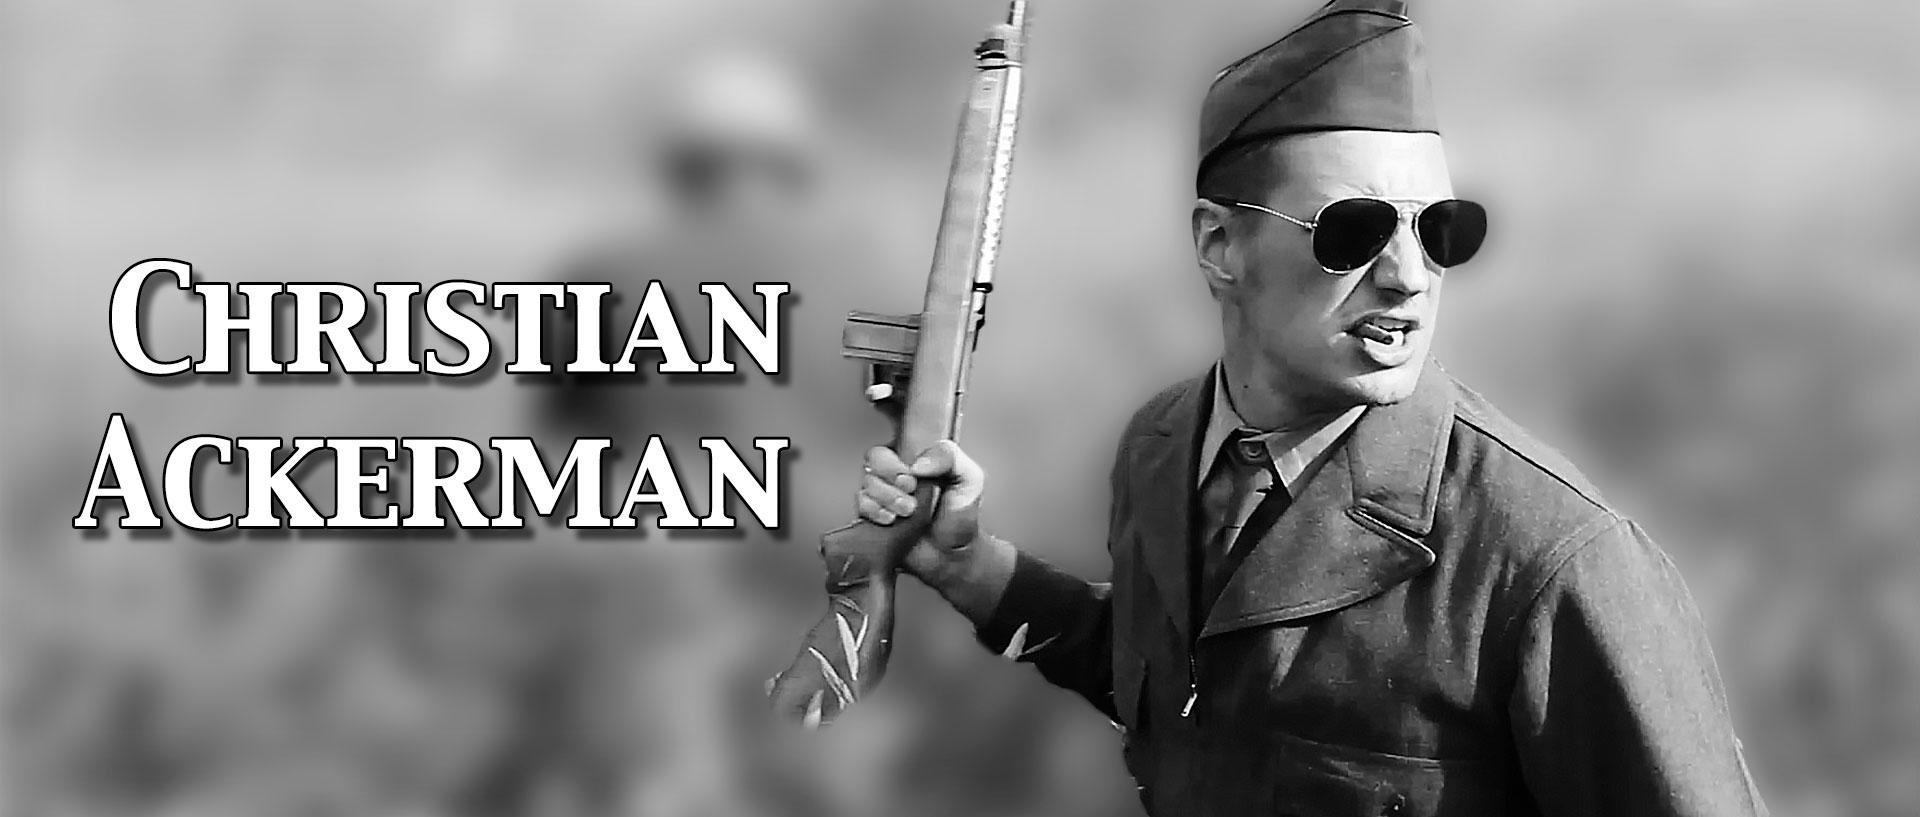 SFTD_18-Christian-Ackerman.jpg